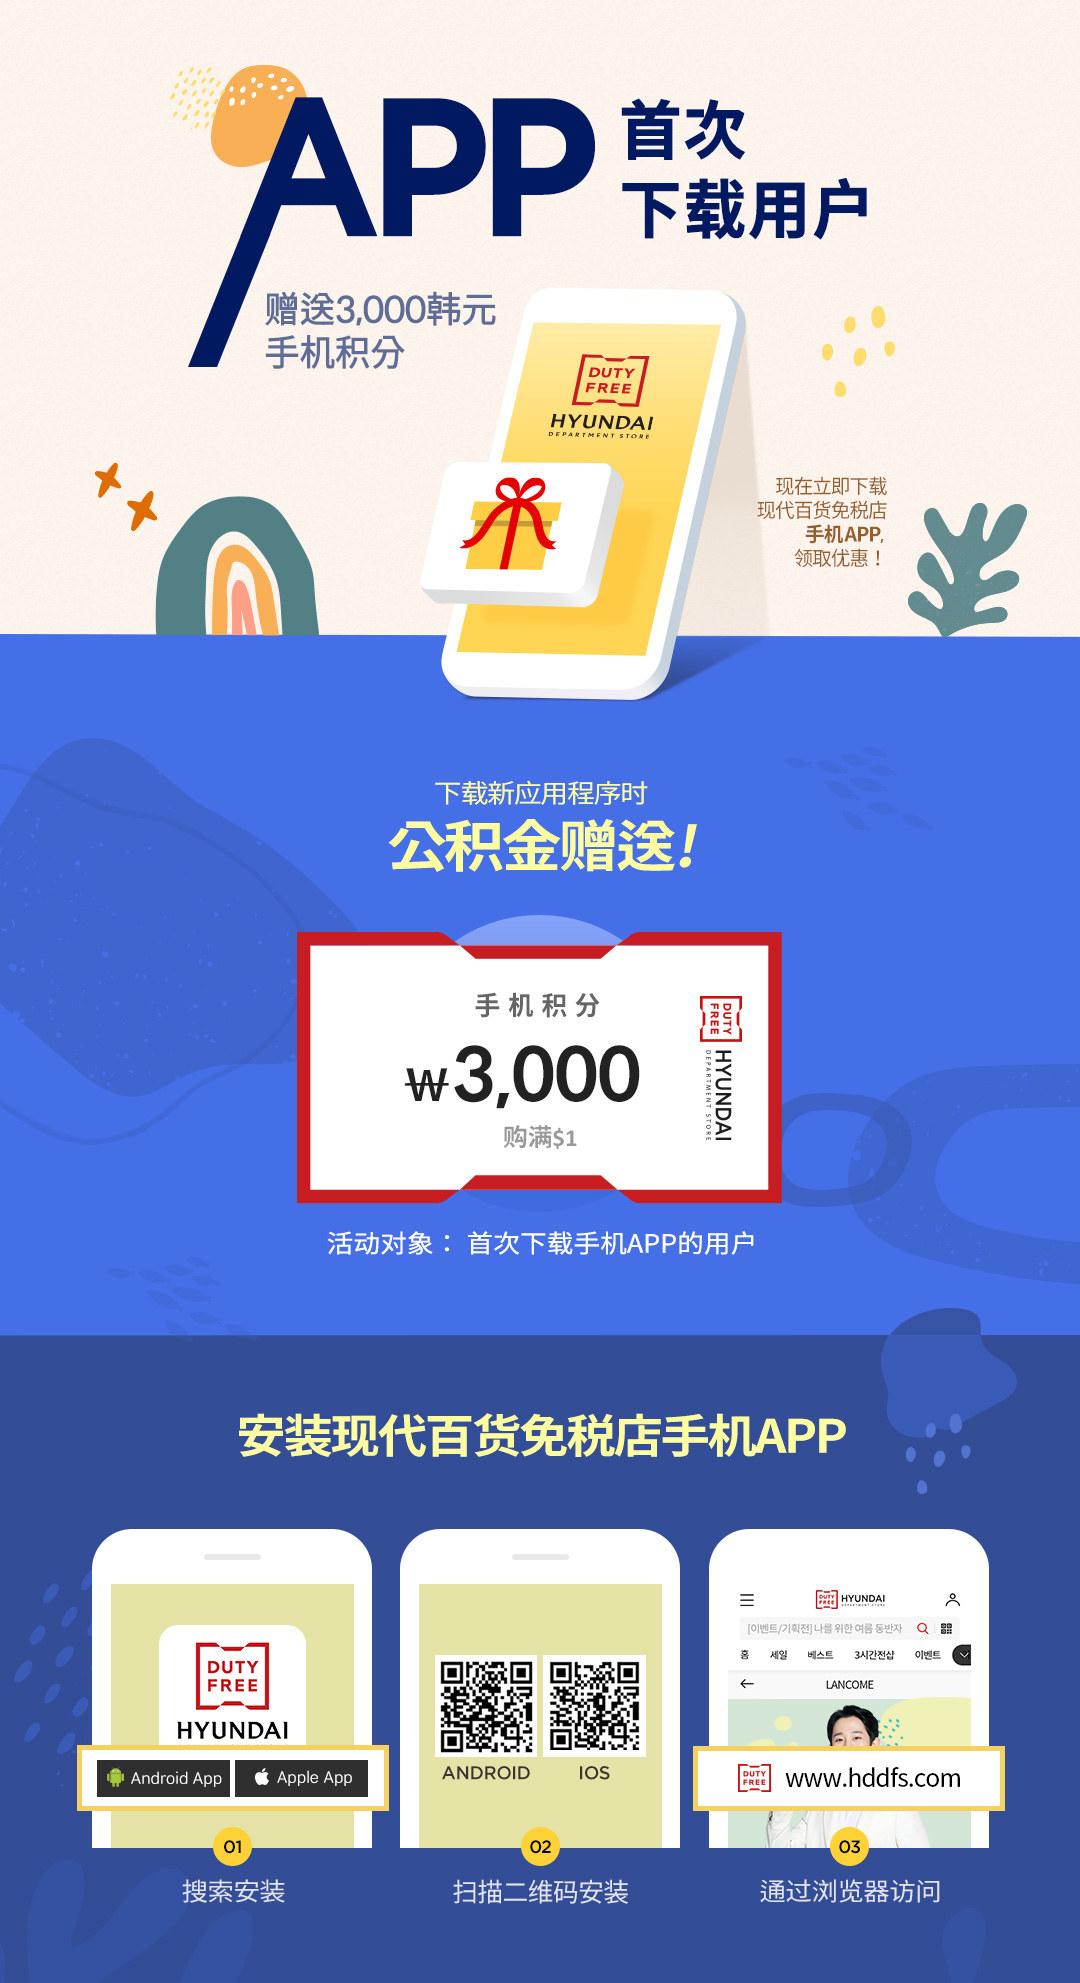 App Download Event